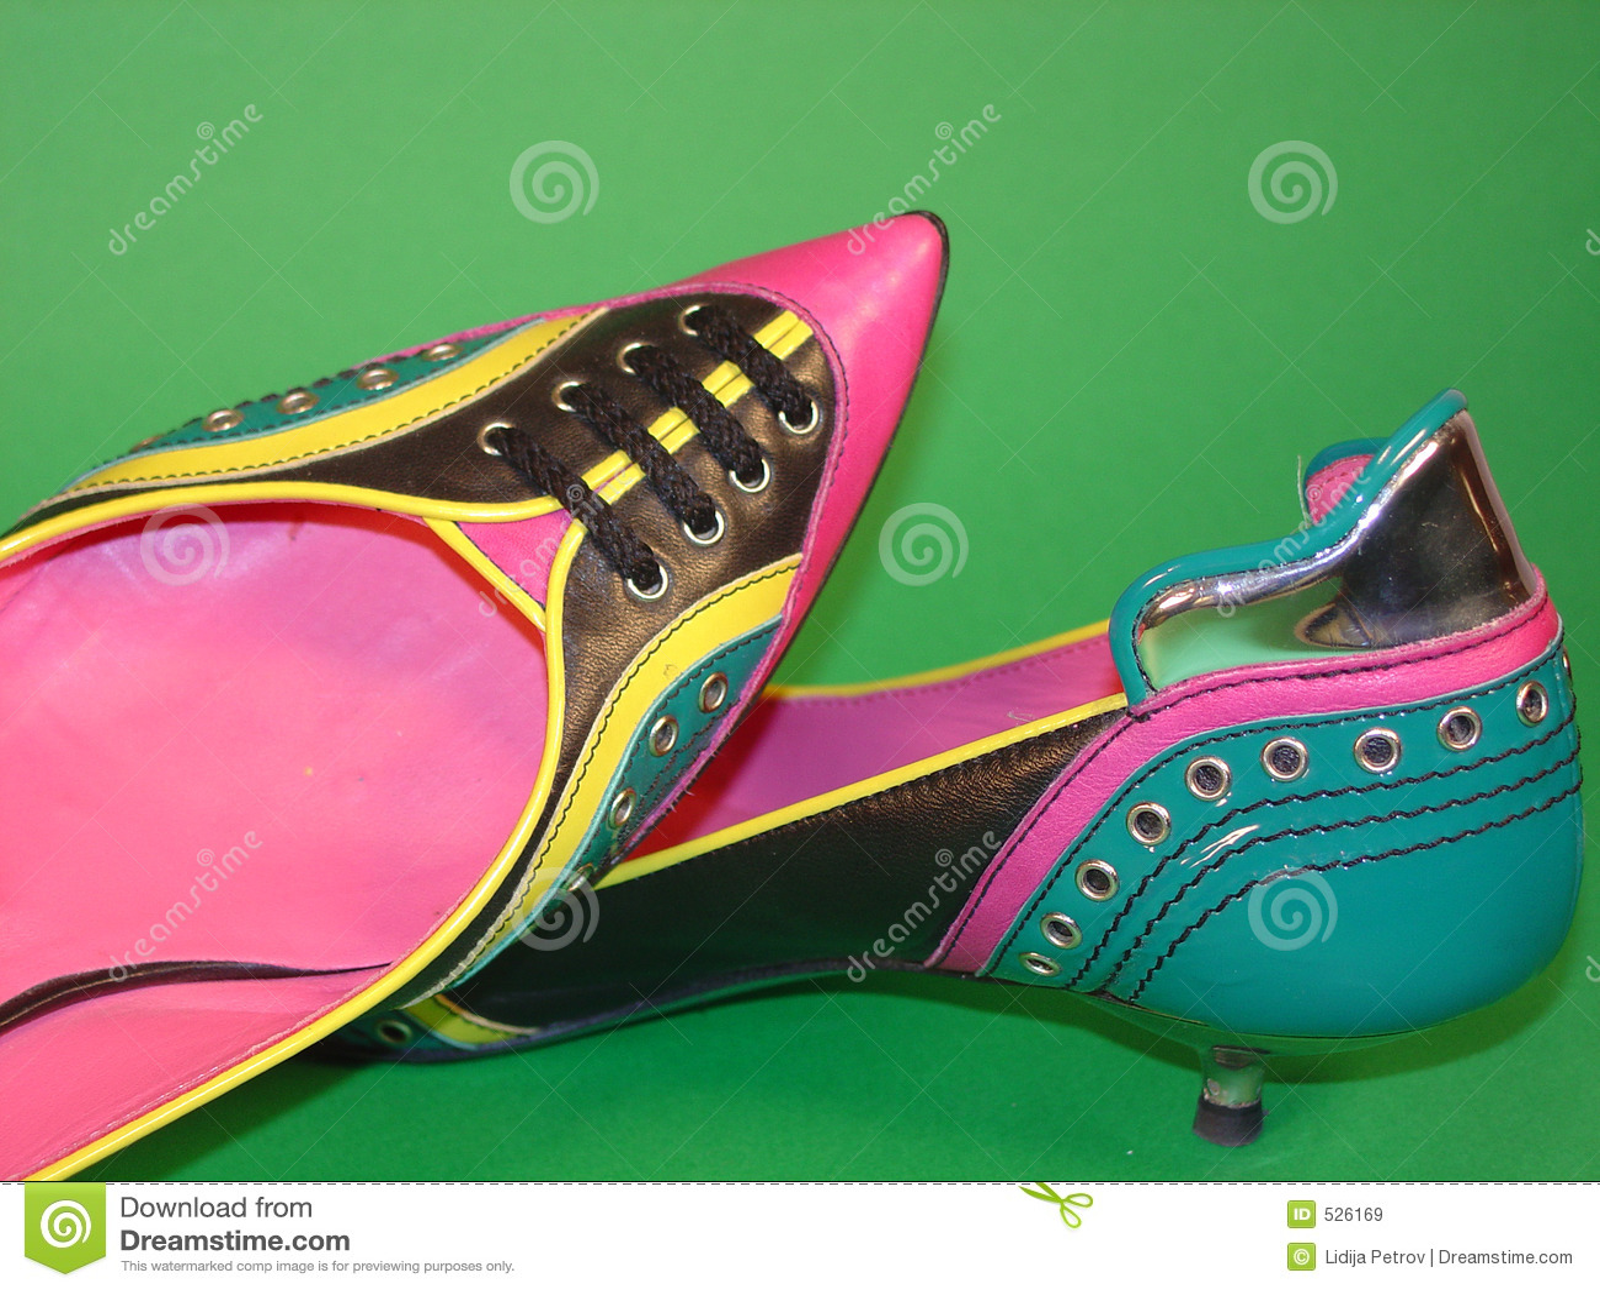 Download 鞋子 库存图片. 图片 包括有 减速火箭, 粉红色, 投反对票, 黄色, 样式, 夫人, 颜色, 生活, 仍然 - 526169